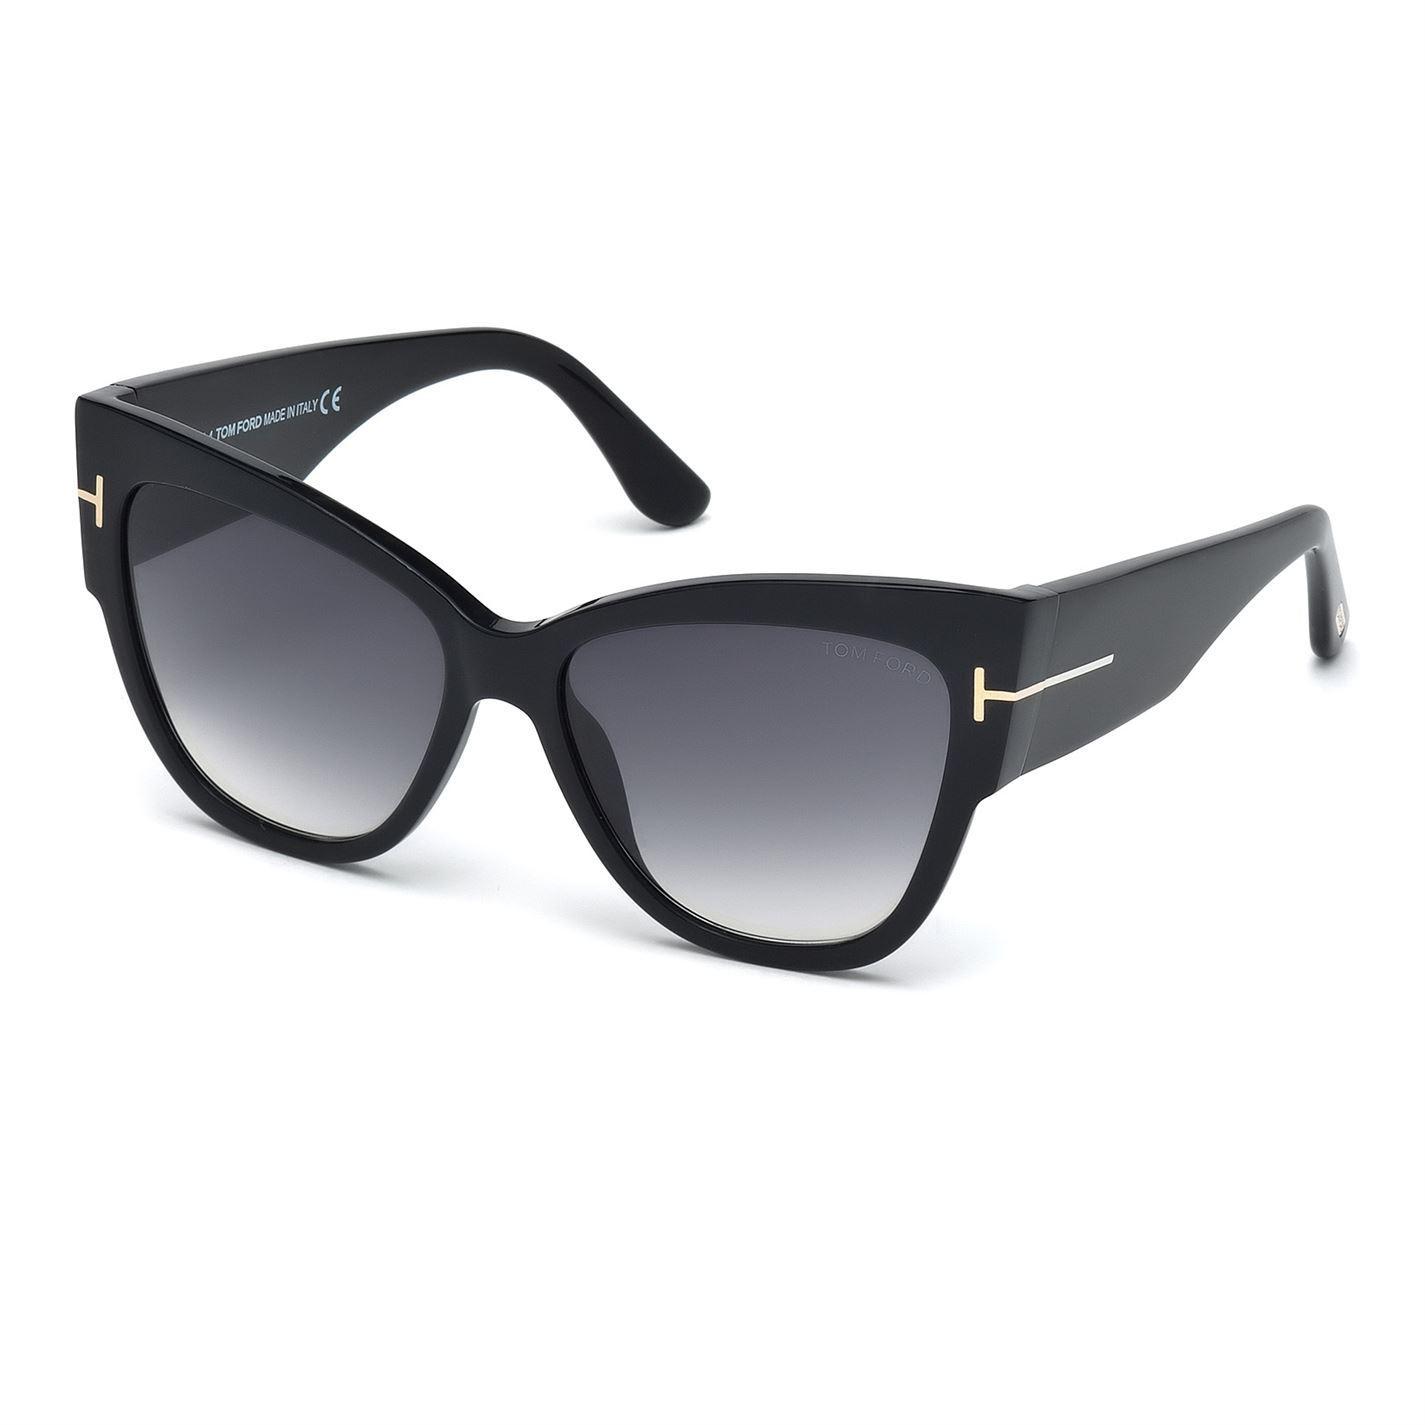 d5957fb1a0608 Tom Ford - Black Polarized Lauren Sunglasses - Lyst. View fullscreen